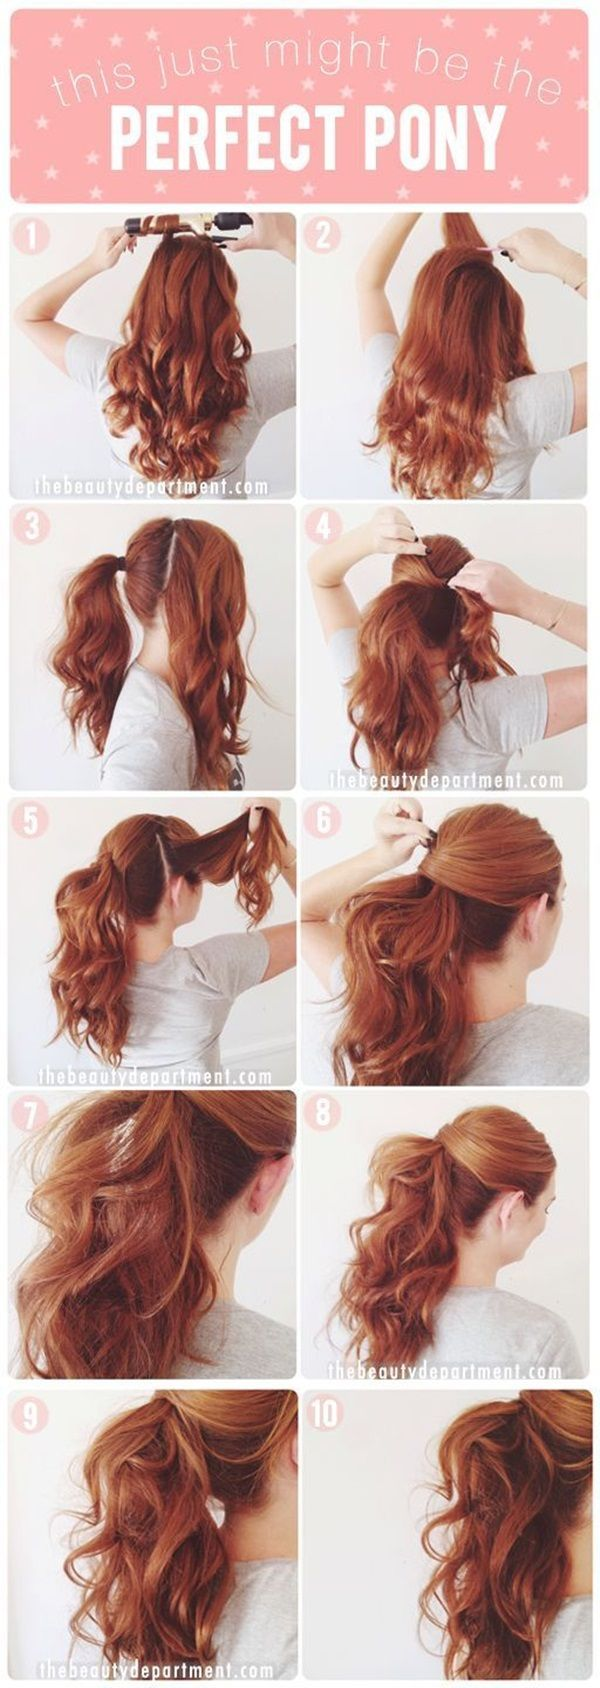 Peachy 1000 Ideas About Diy Hairstyles On Pinterest Easy Diy Short Hairstyles Gunalazisus